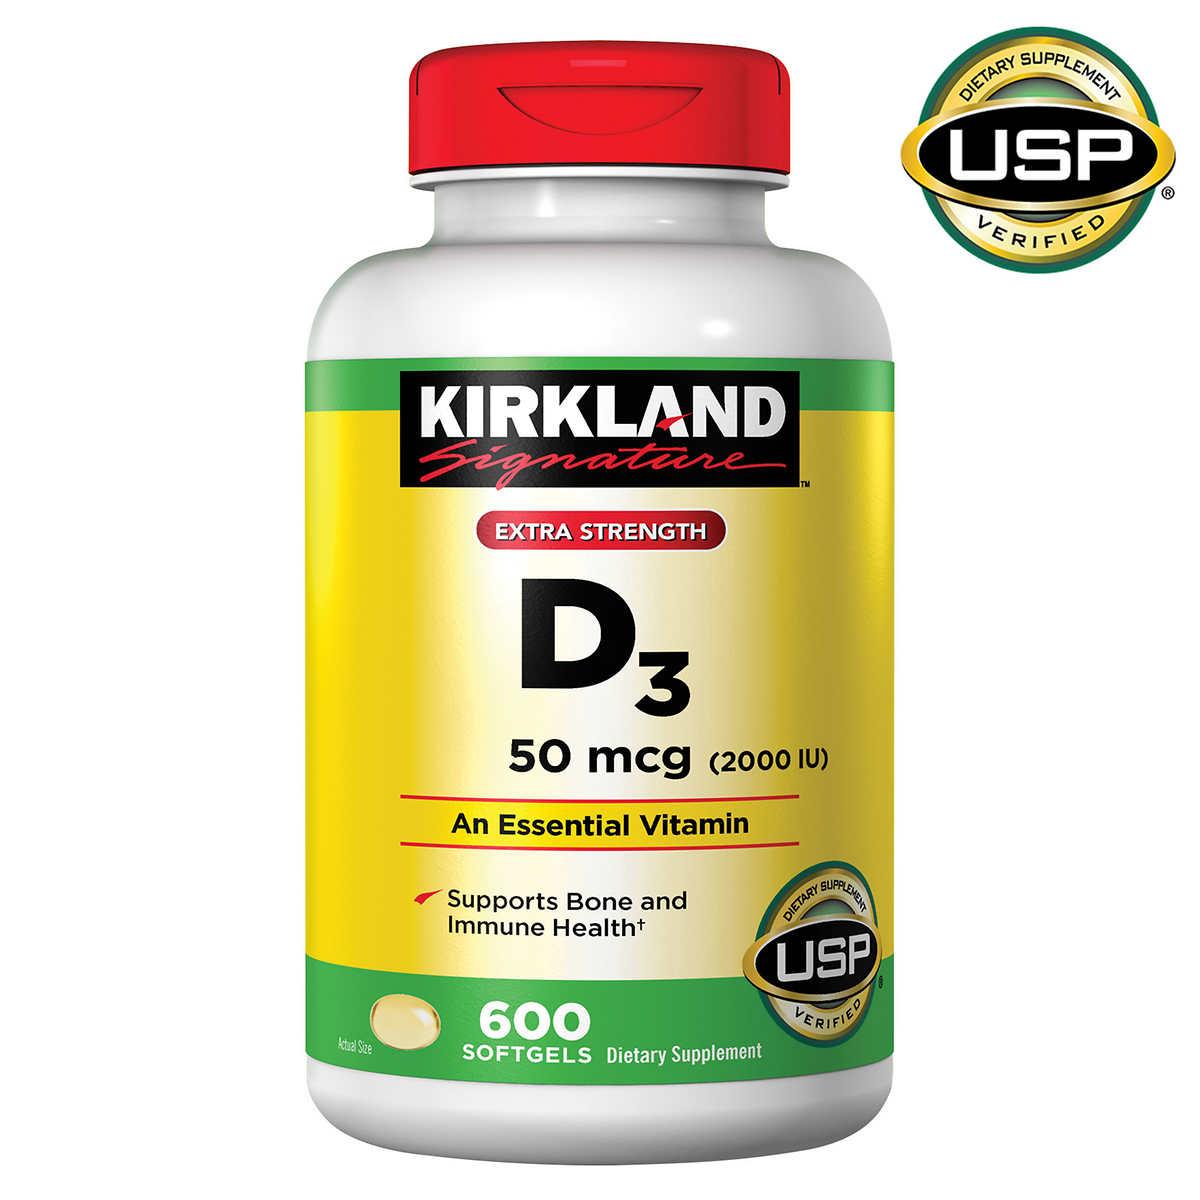 Kirkland Signature Extra Strength D3 50 Mcg 600 Softgels